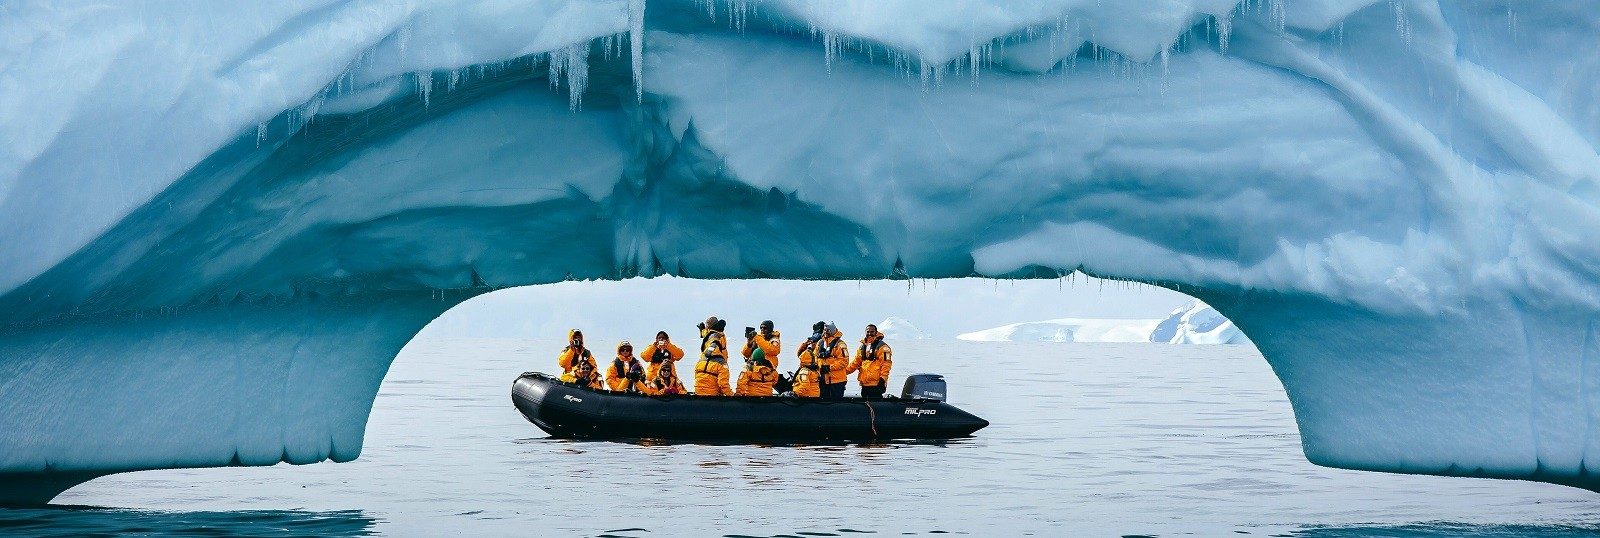 Enchanting Travels Polar Regions Tour